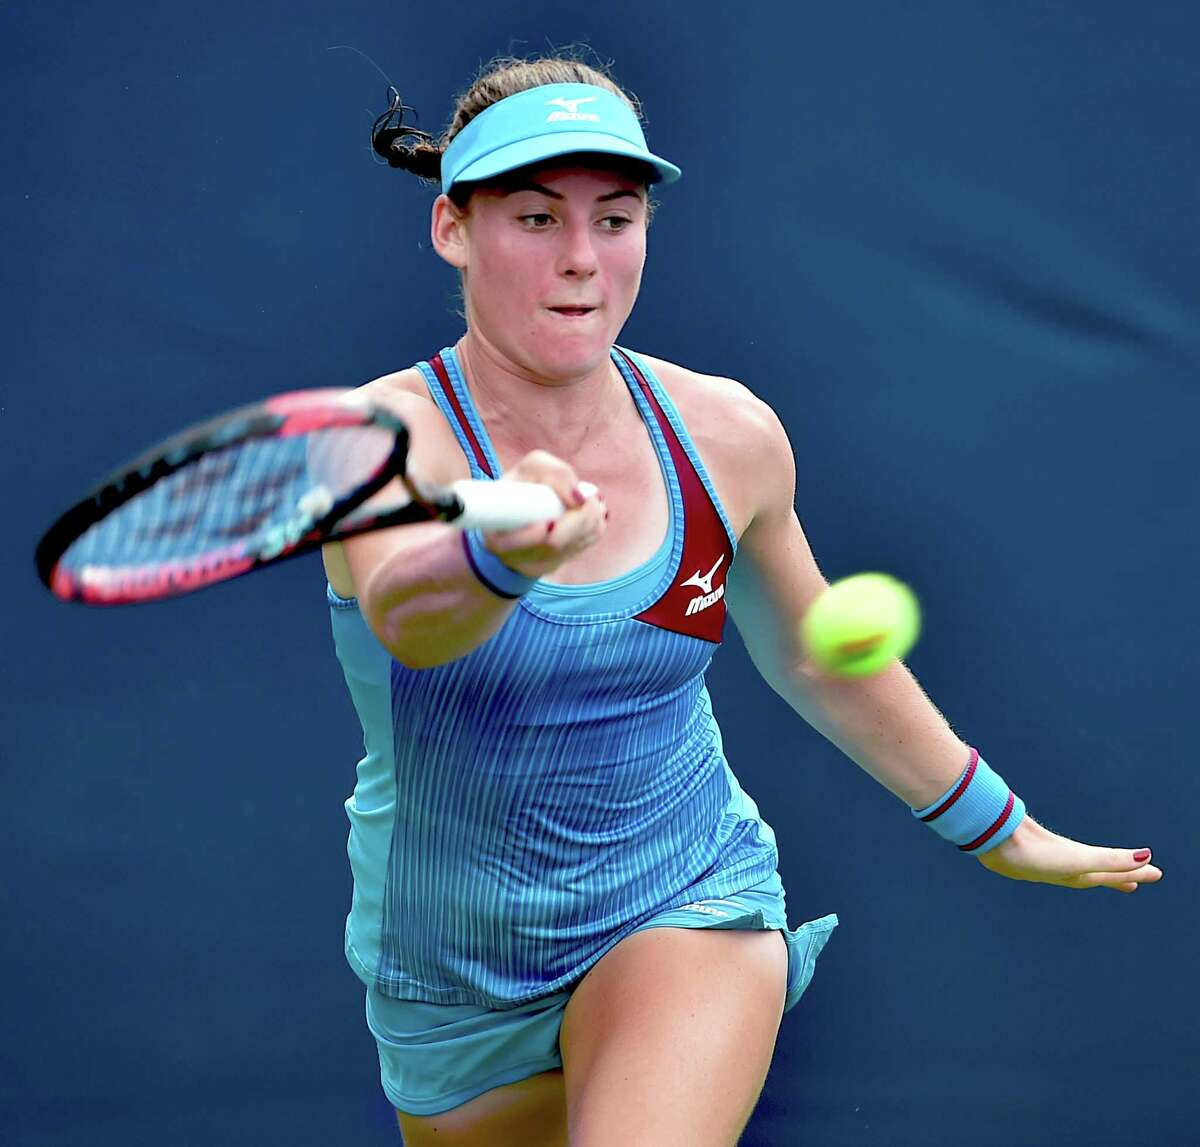 Tamara Zidansek returns to Maria Sanchez in the qualifying round Friday at the Connecticut Open in New Haven. Zidansek won, 7-5, 7-6.